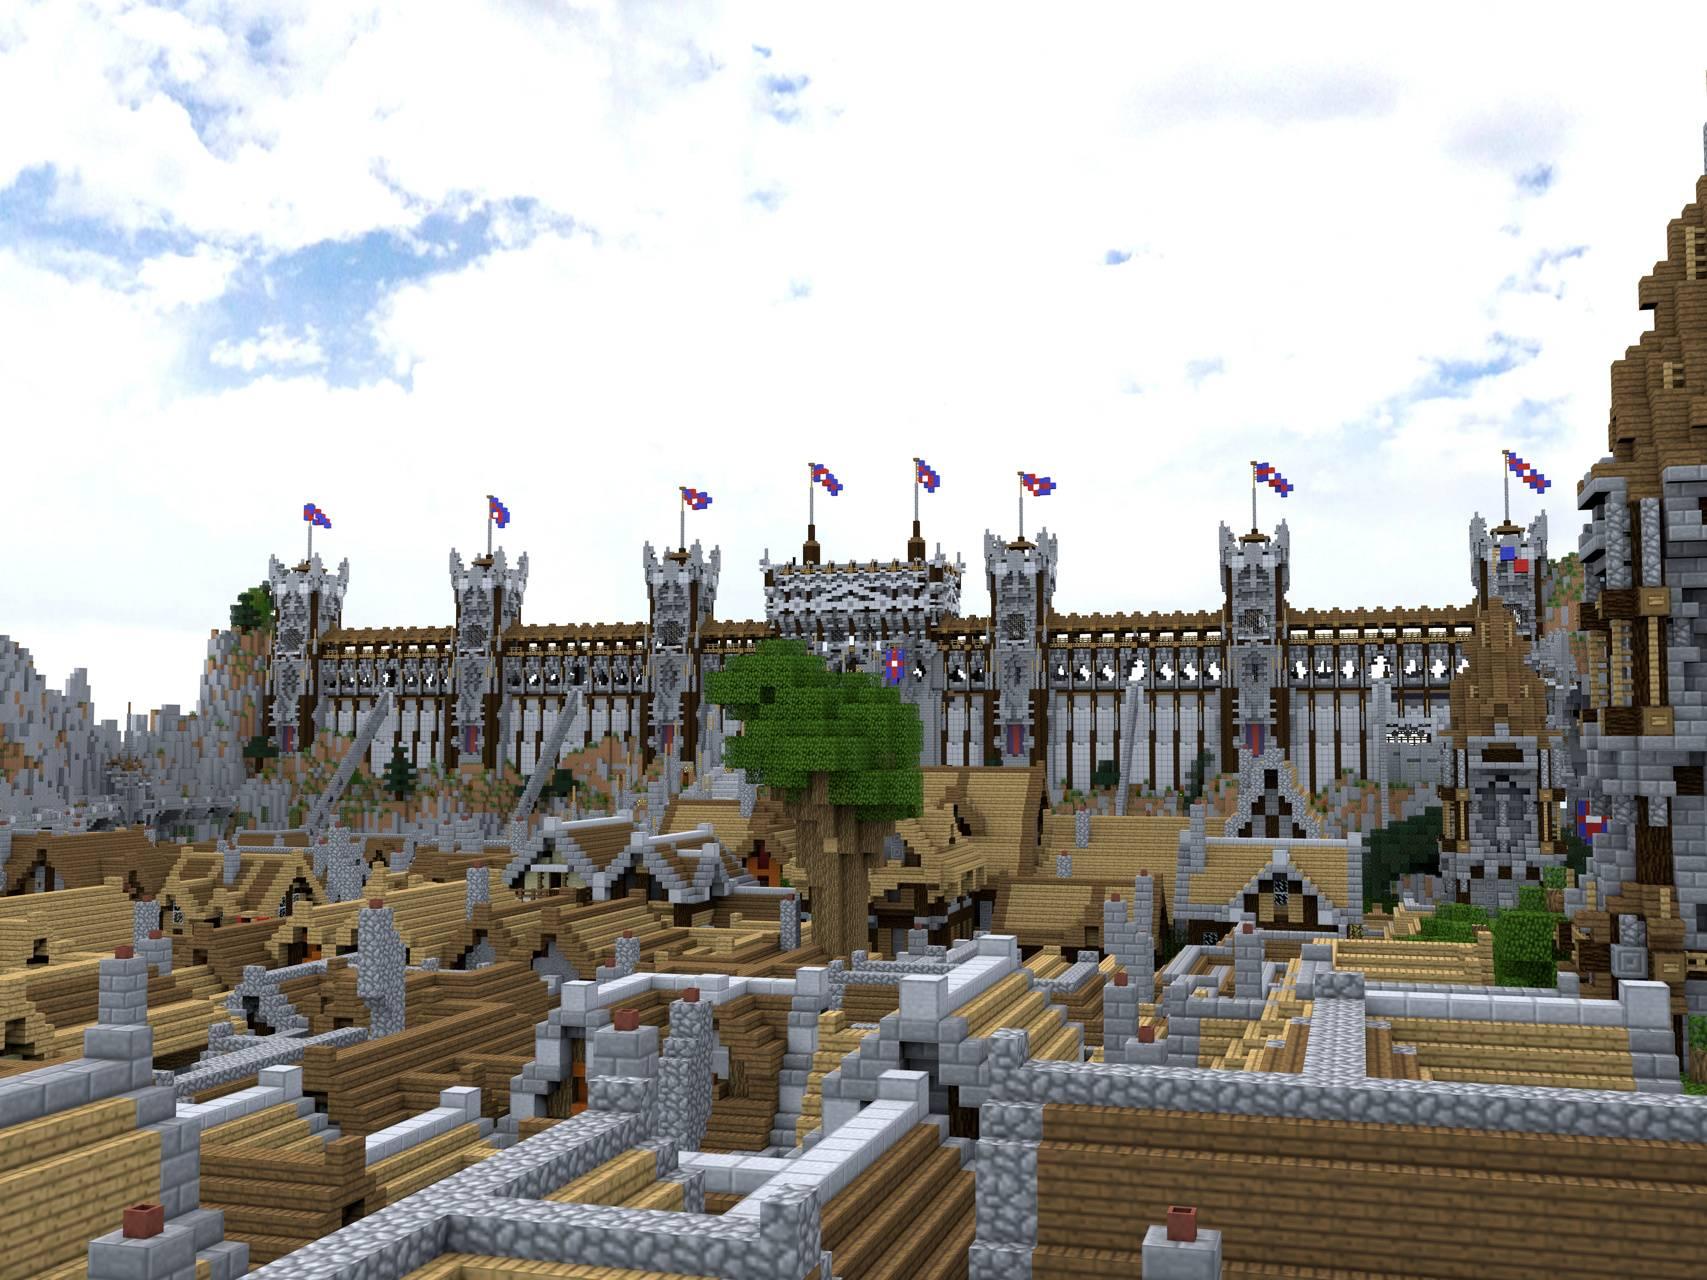 Kingdom of Galekin